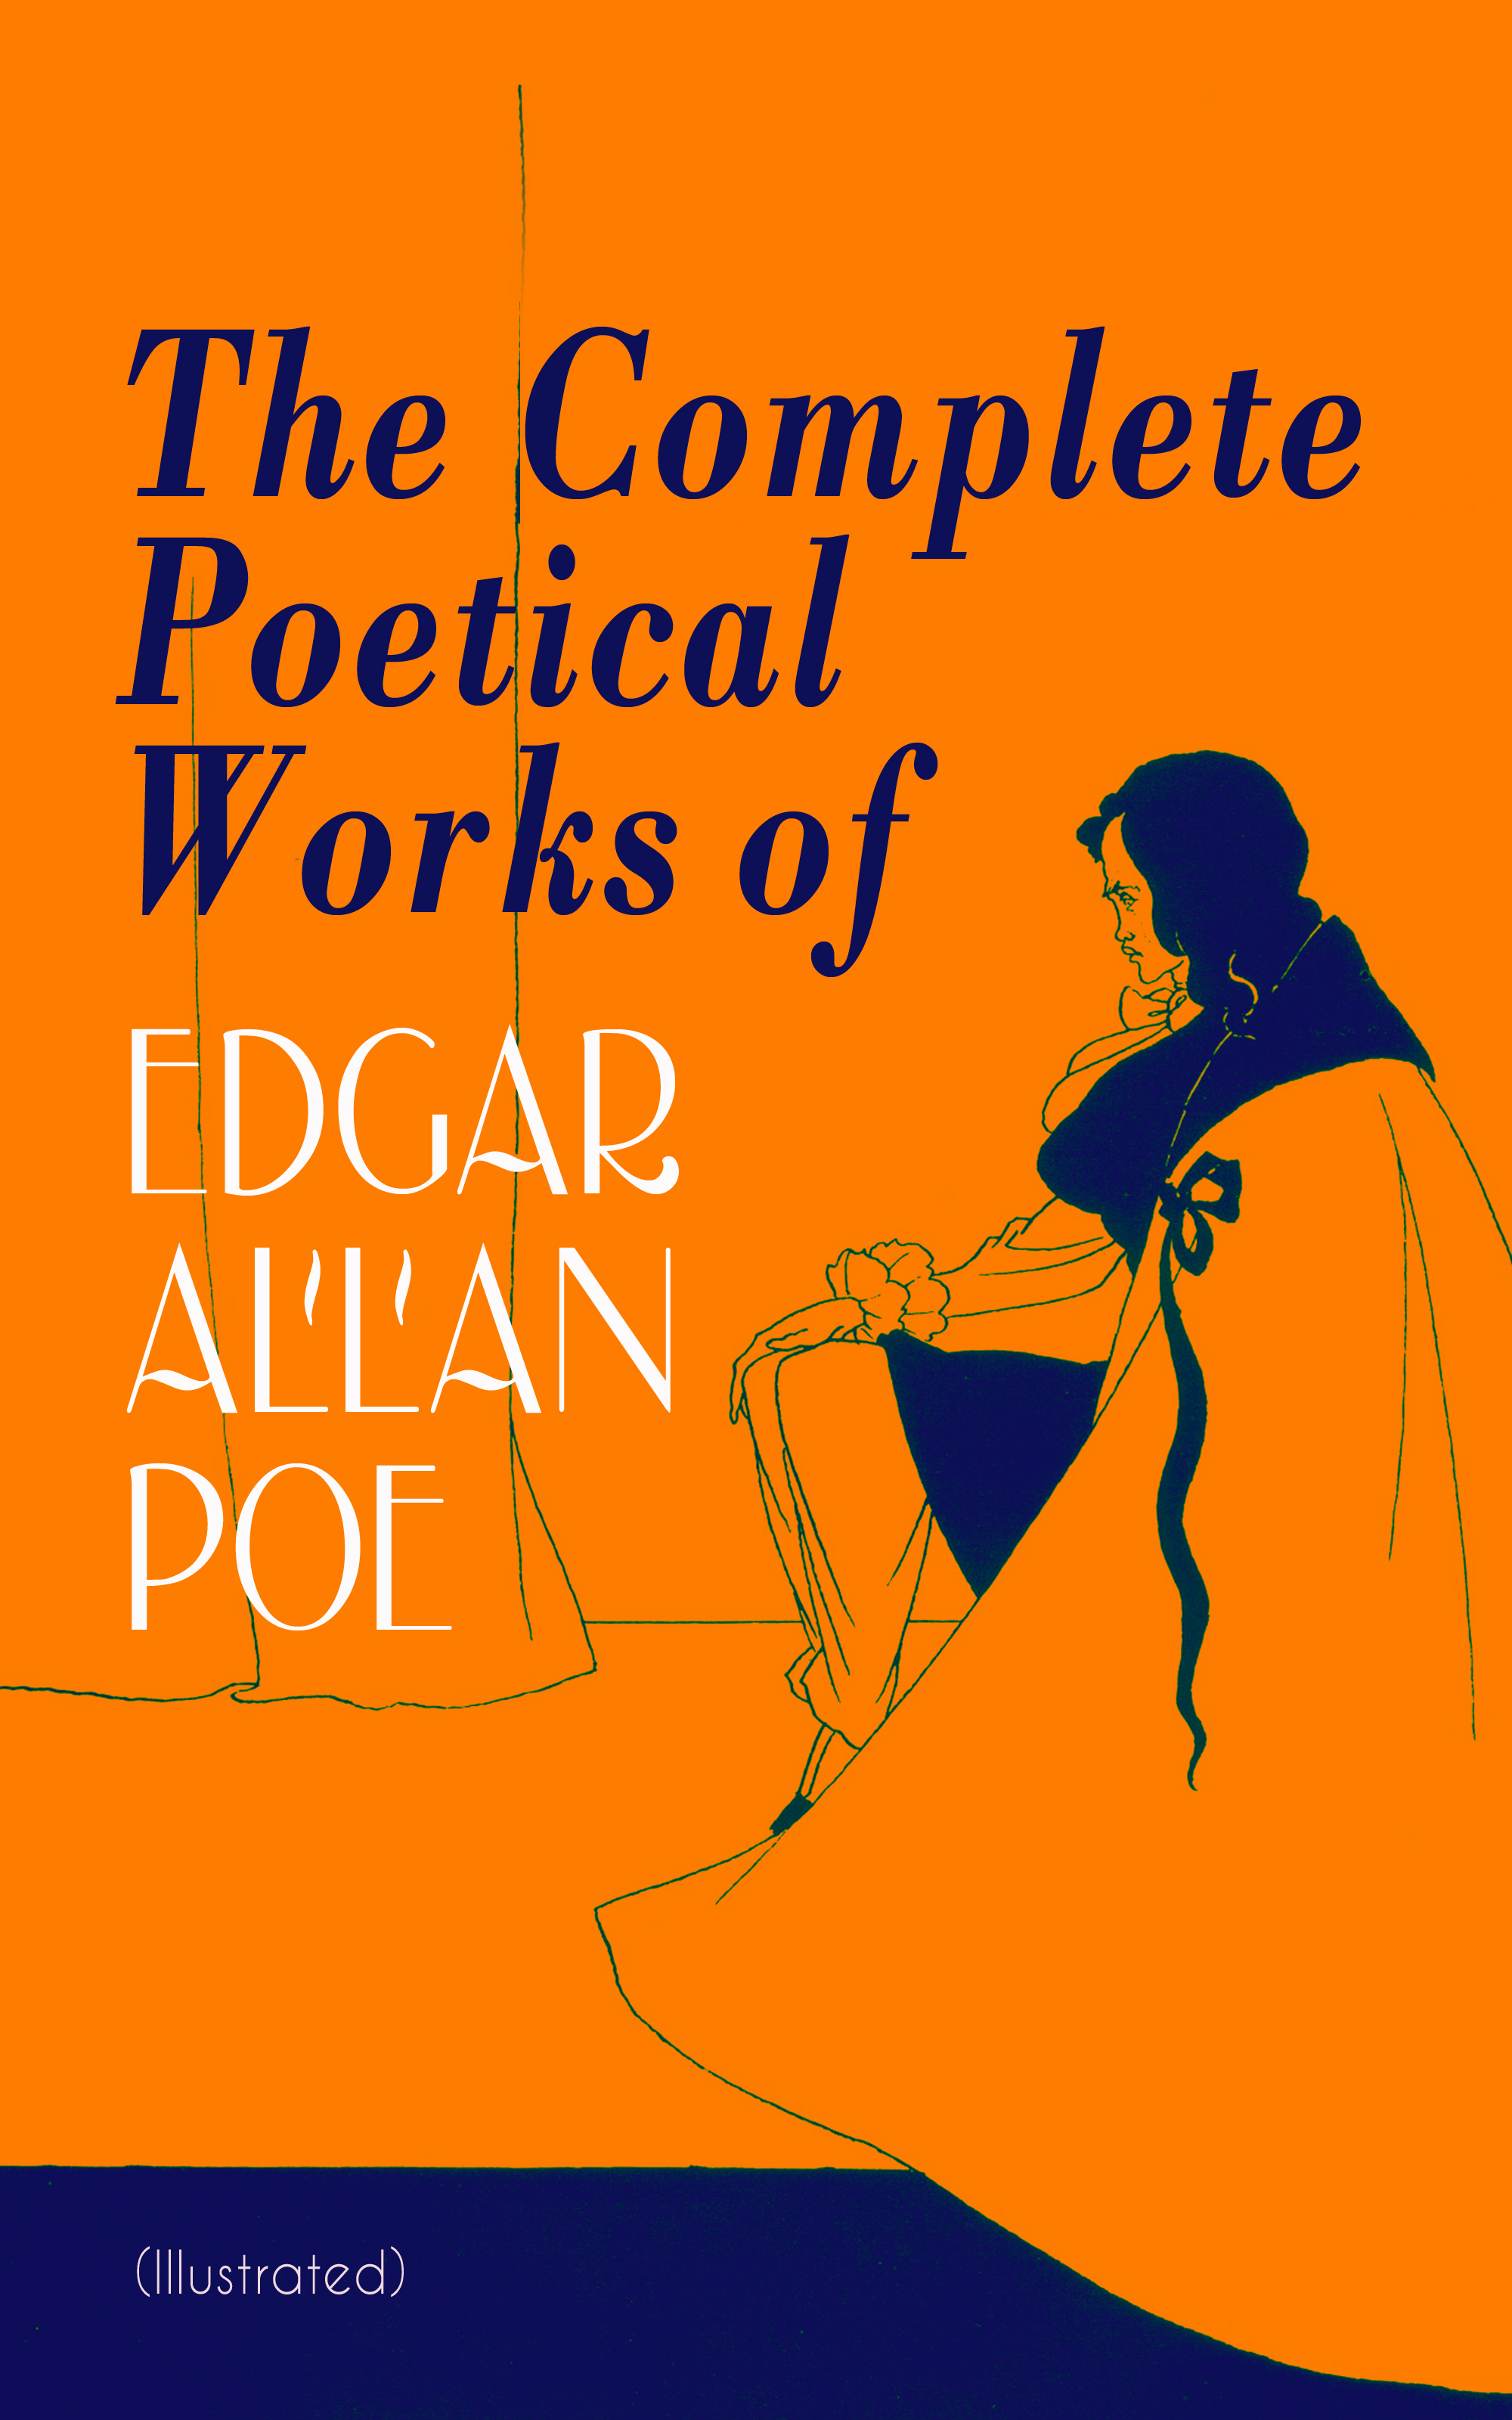 Эдгар Аллан По The Complete Poetical Works of Edgar Allan Poe (Illustrated) эдгар аллан по the works of edgar allan poe volume 2